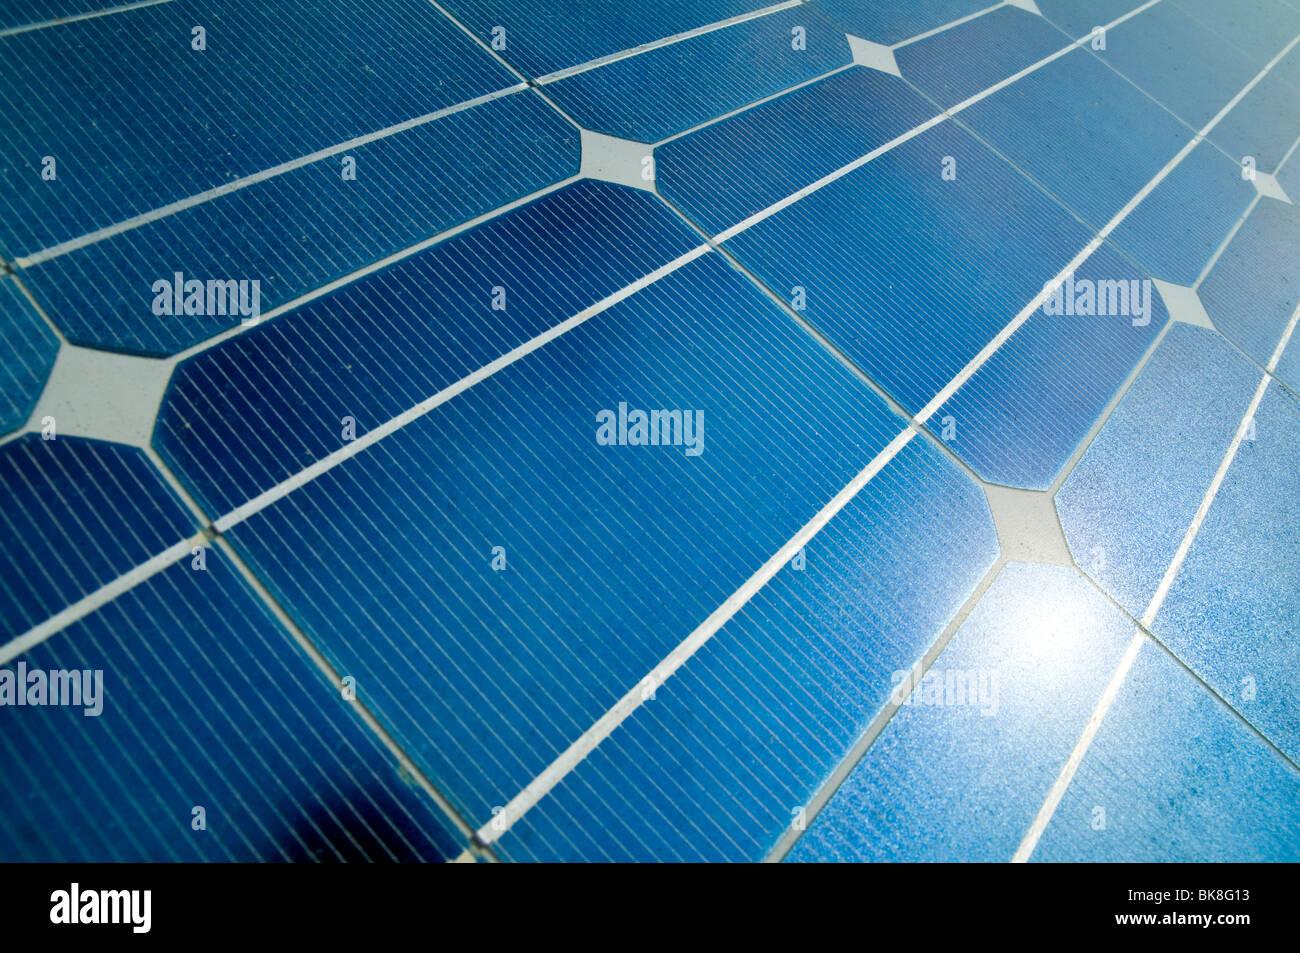 Detalle del panel solar Imagen De Stock